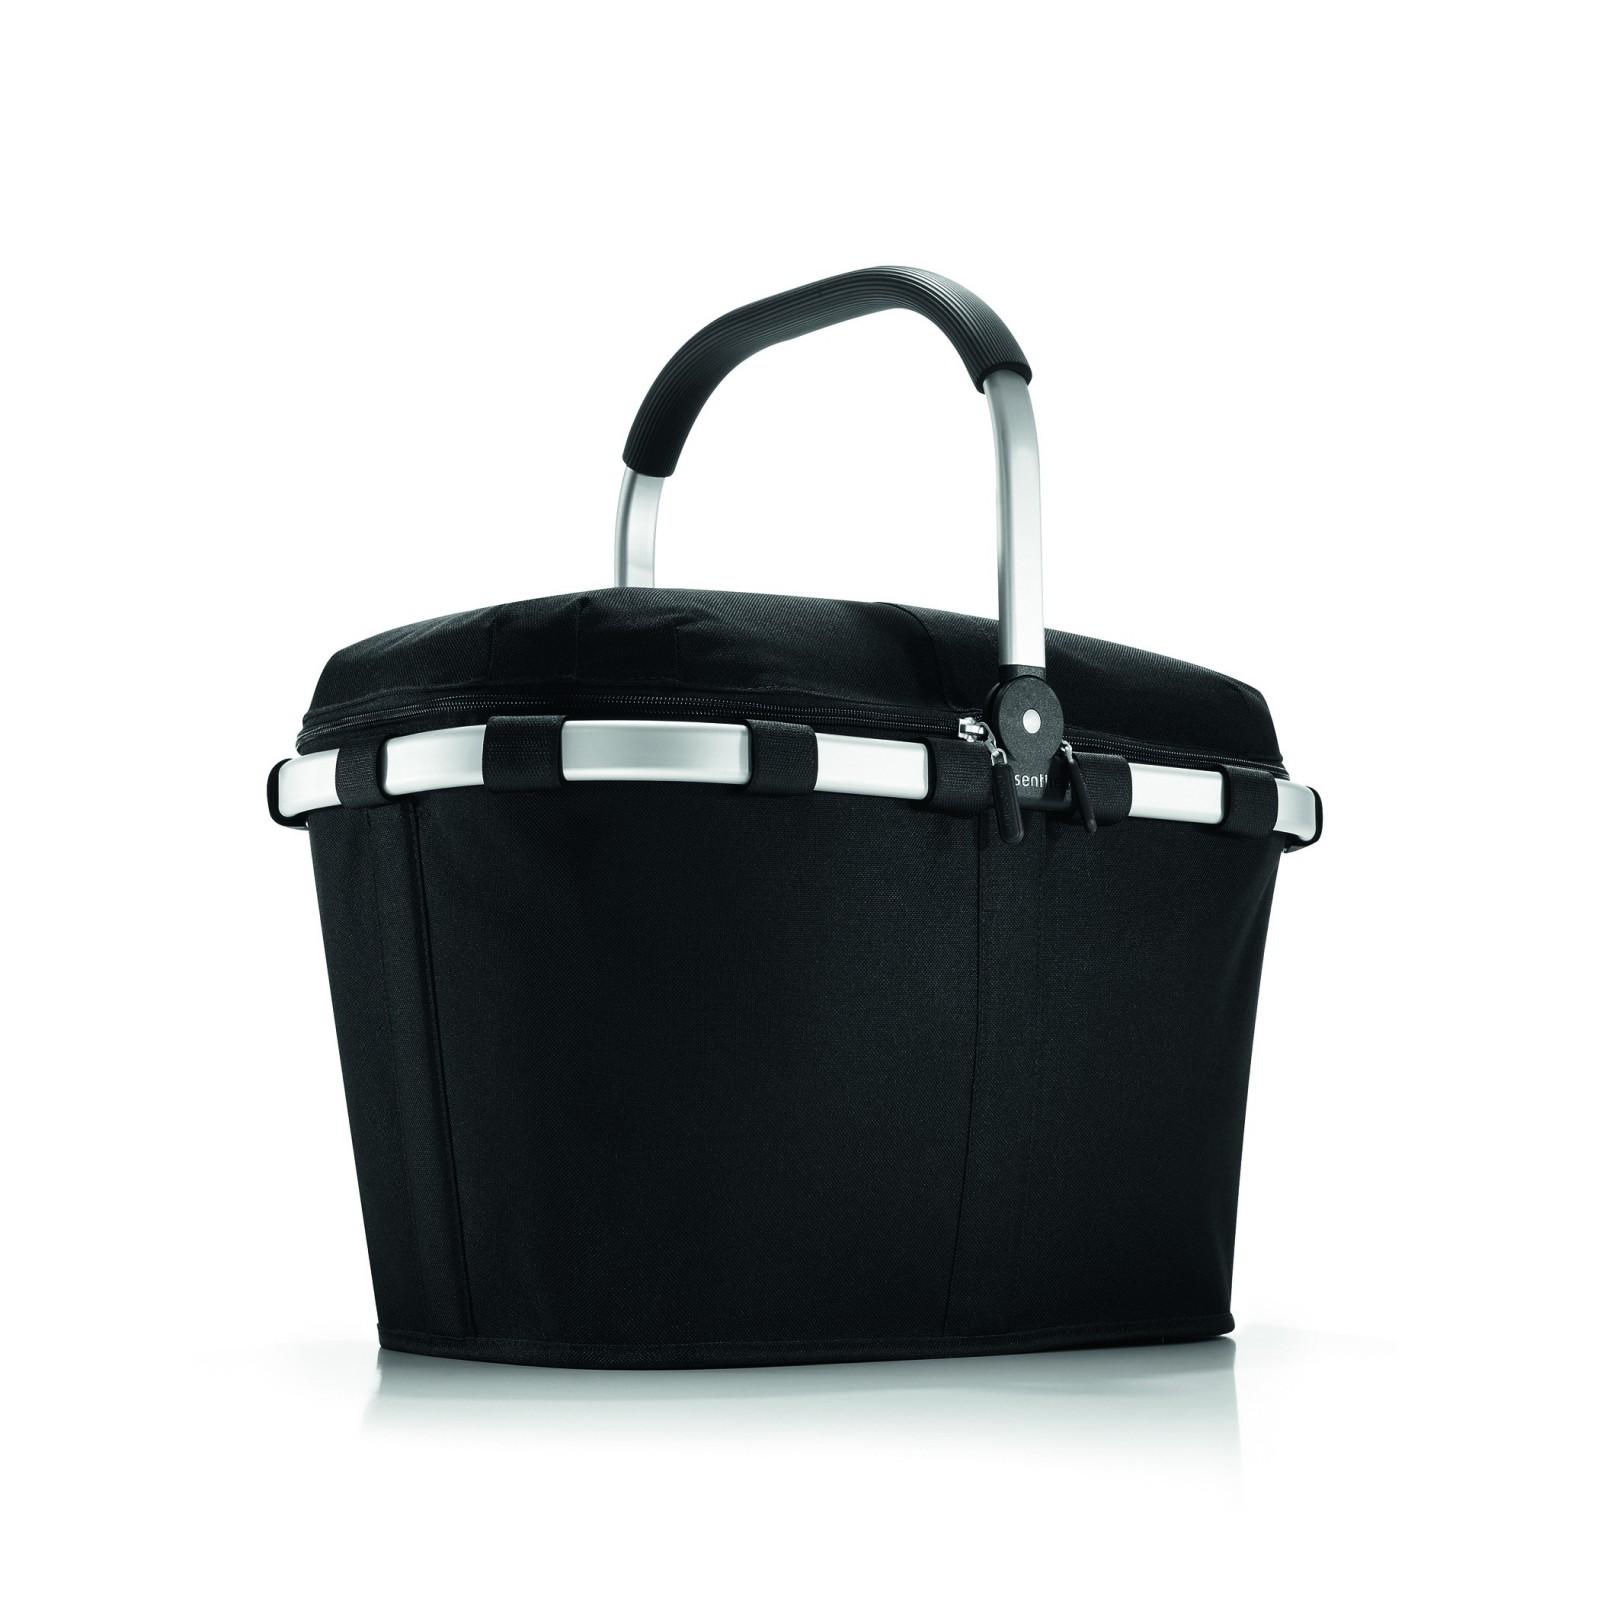 reisenthel einkaufskorb k hltasche tasche korb carrybag. Black Bedroom Furniture Sets. Home Design Ideas